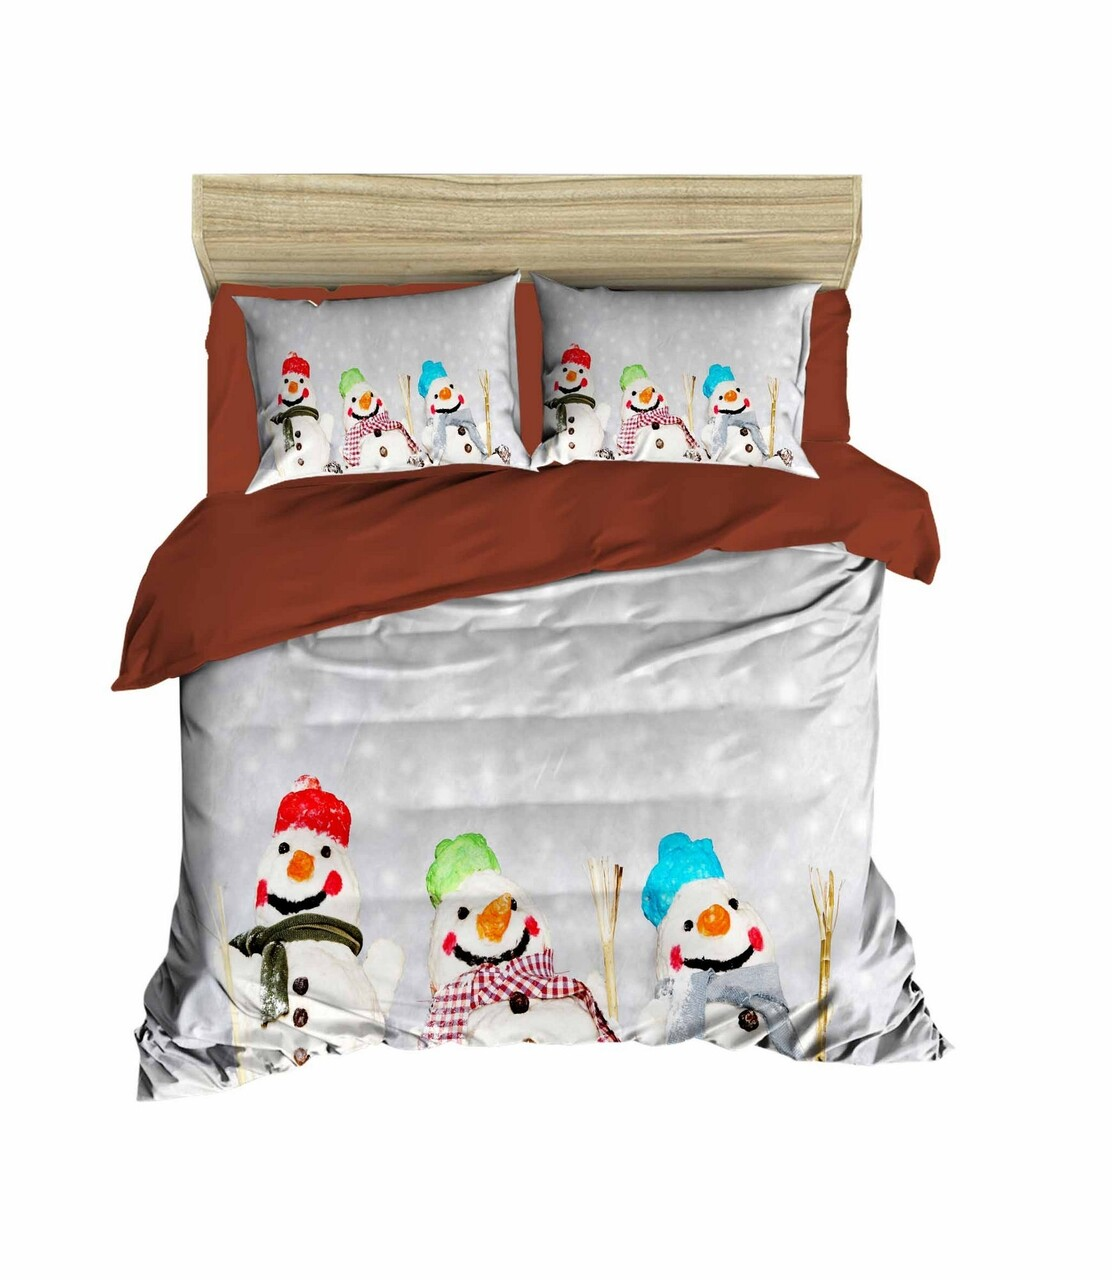 Lenjerie de pat pentru doua persoane, Pearl Home, 403, print 3D, policoton, 4 piese, maro/alb/gri